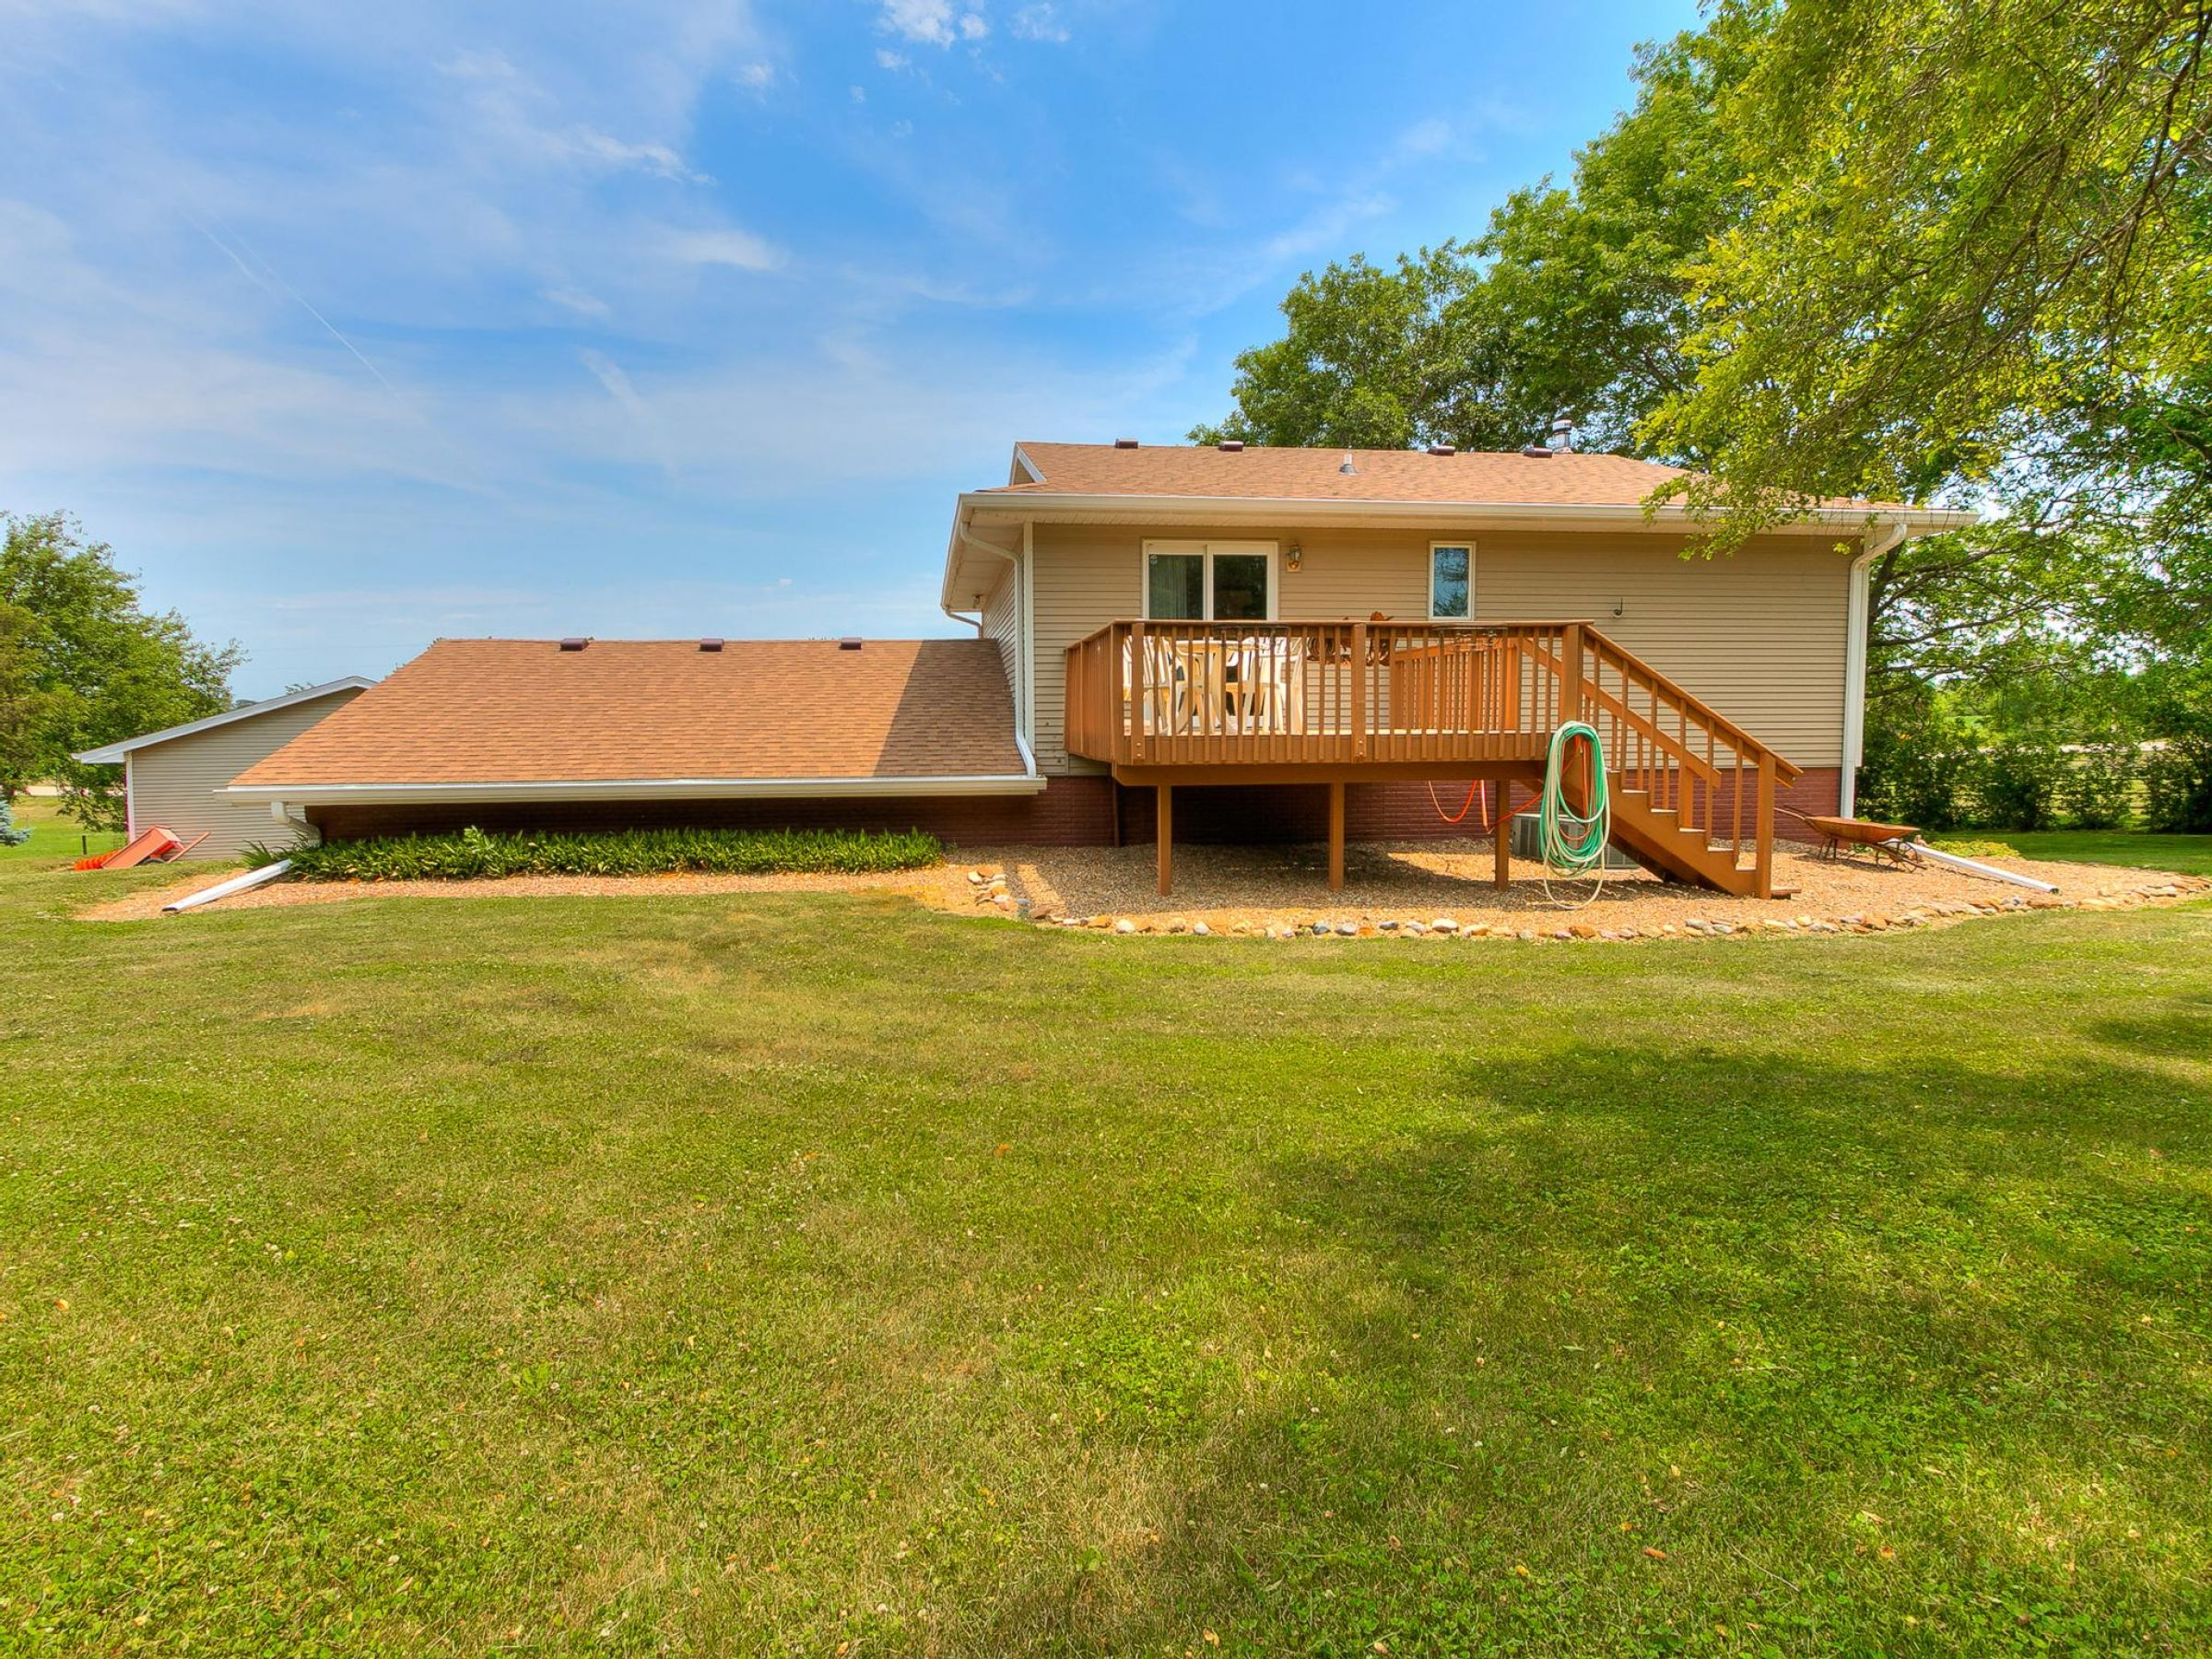 residential-warren-county-iowa-3-acres-listing-number-15593-1-2021-06-18-154659.jpg